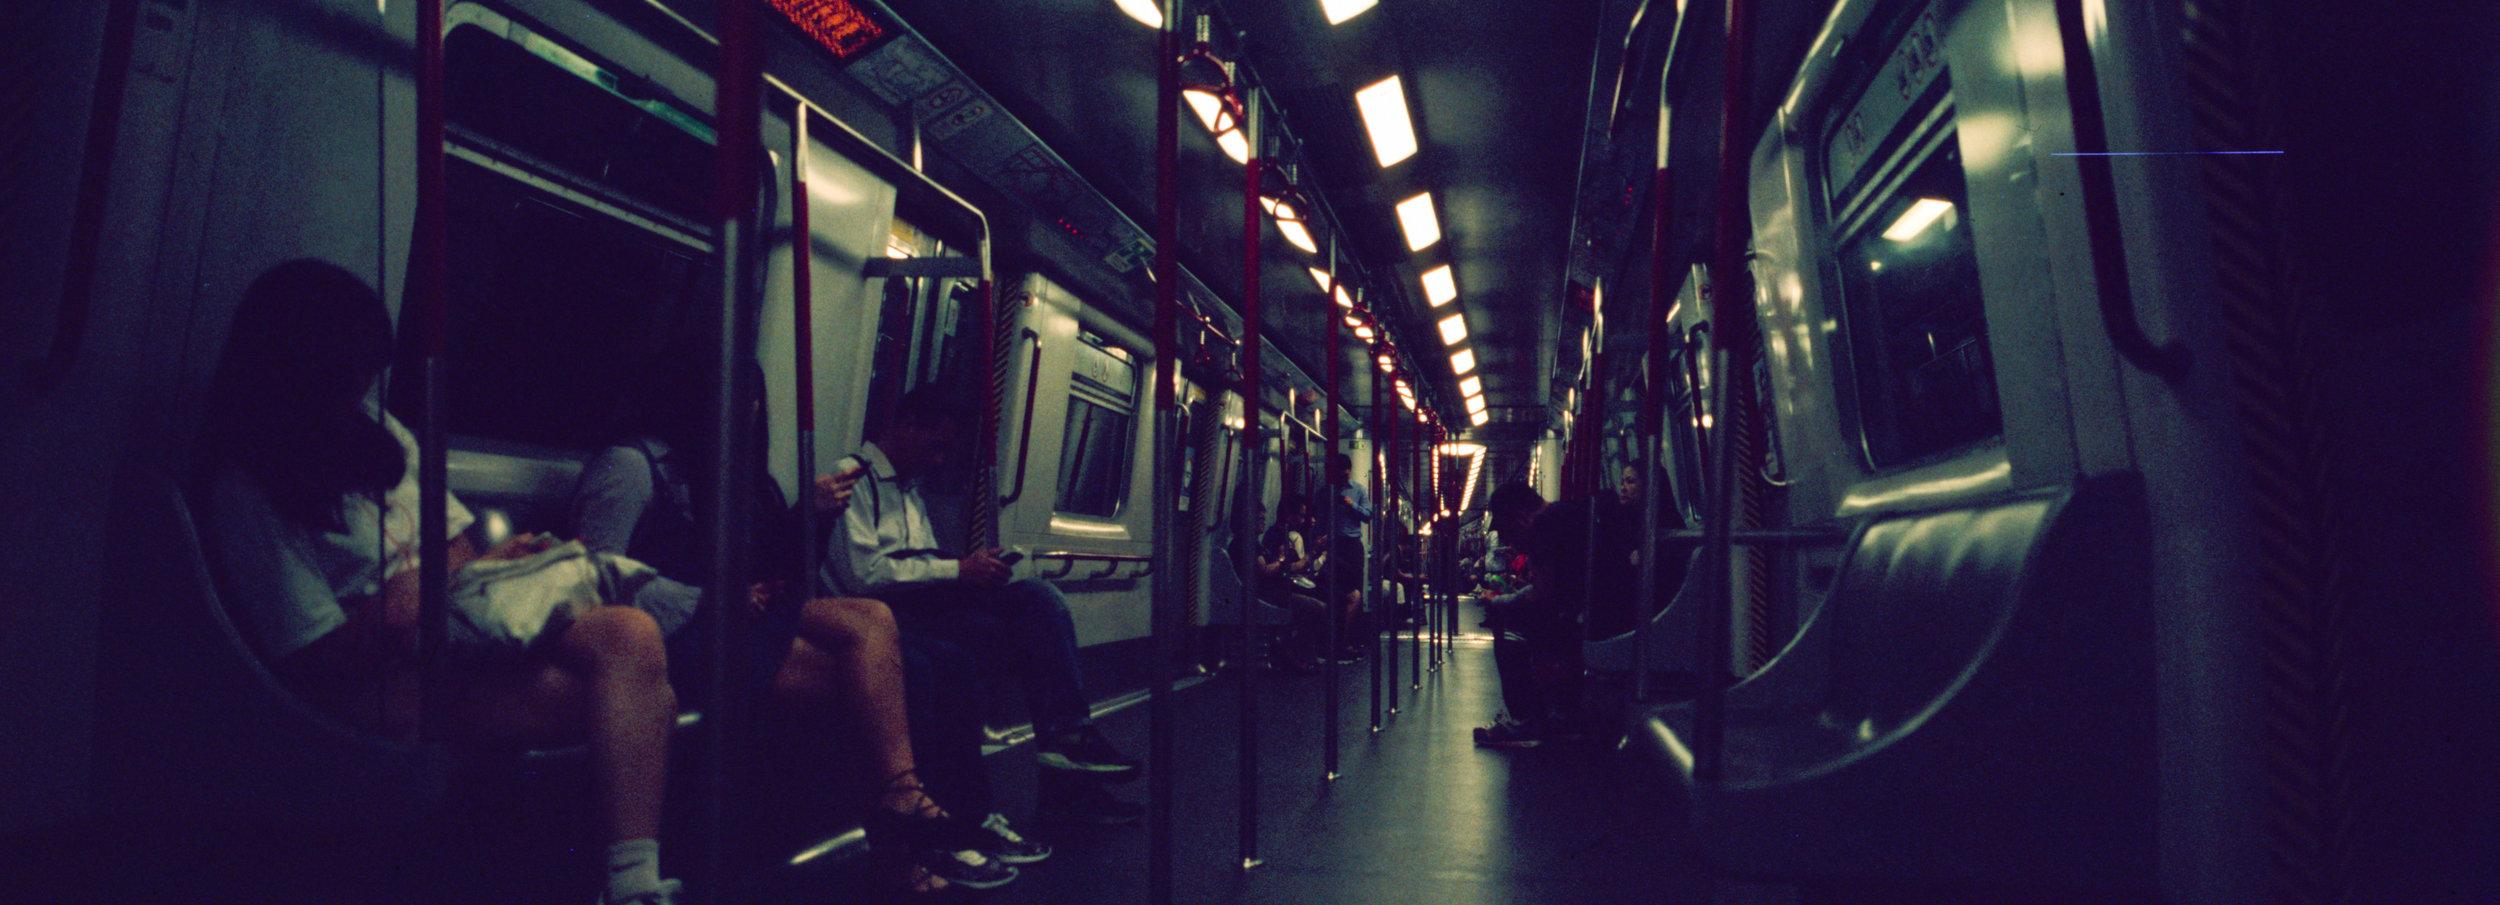 Travel photography-9.jpg